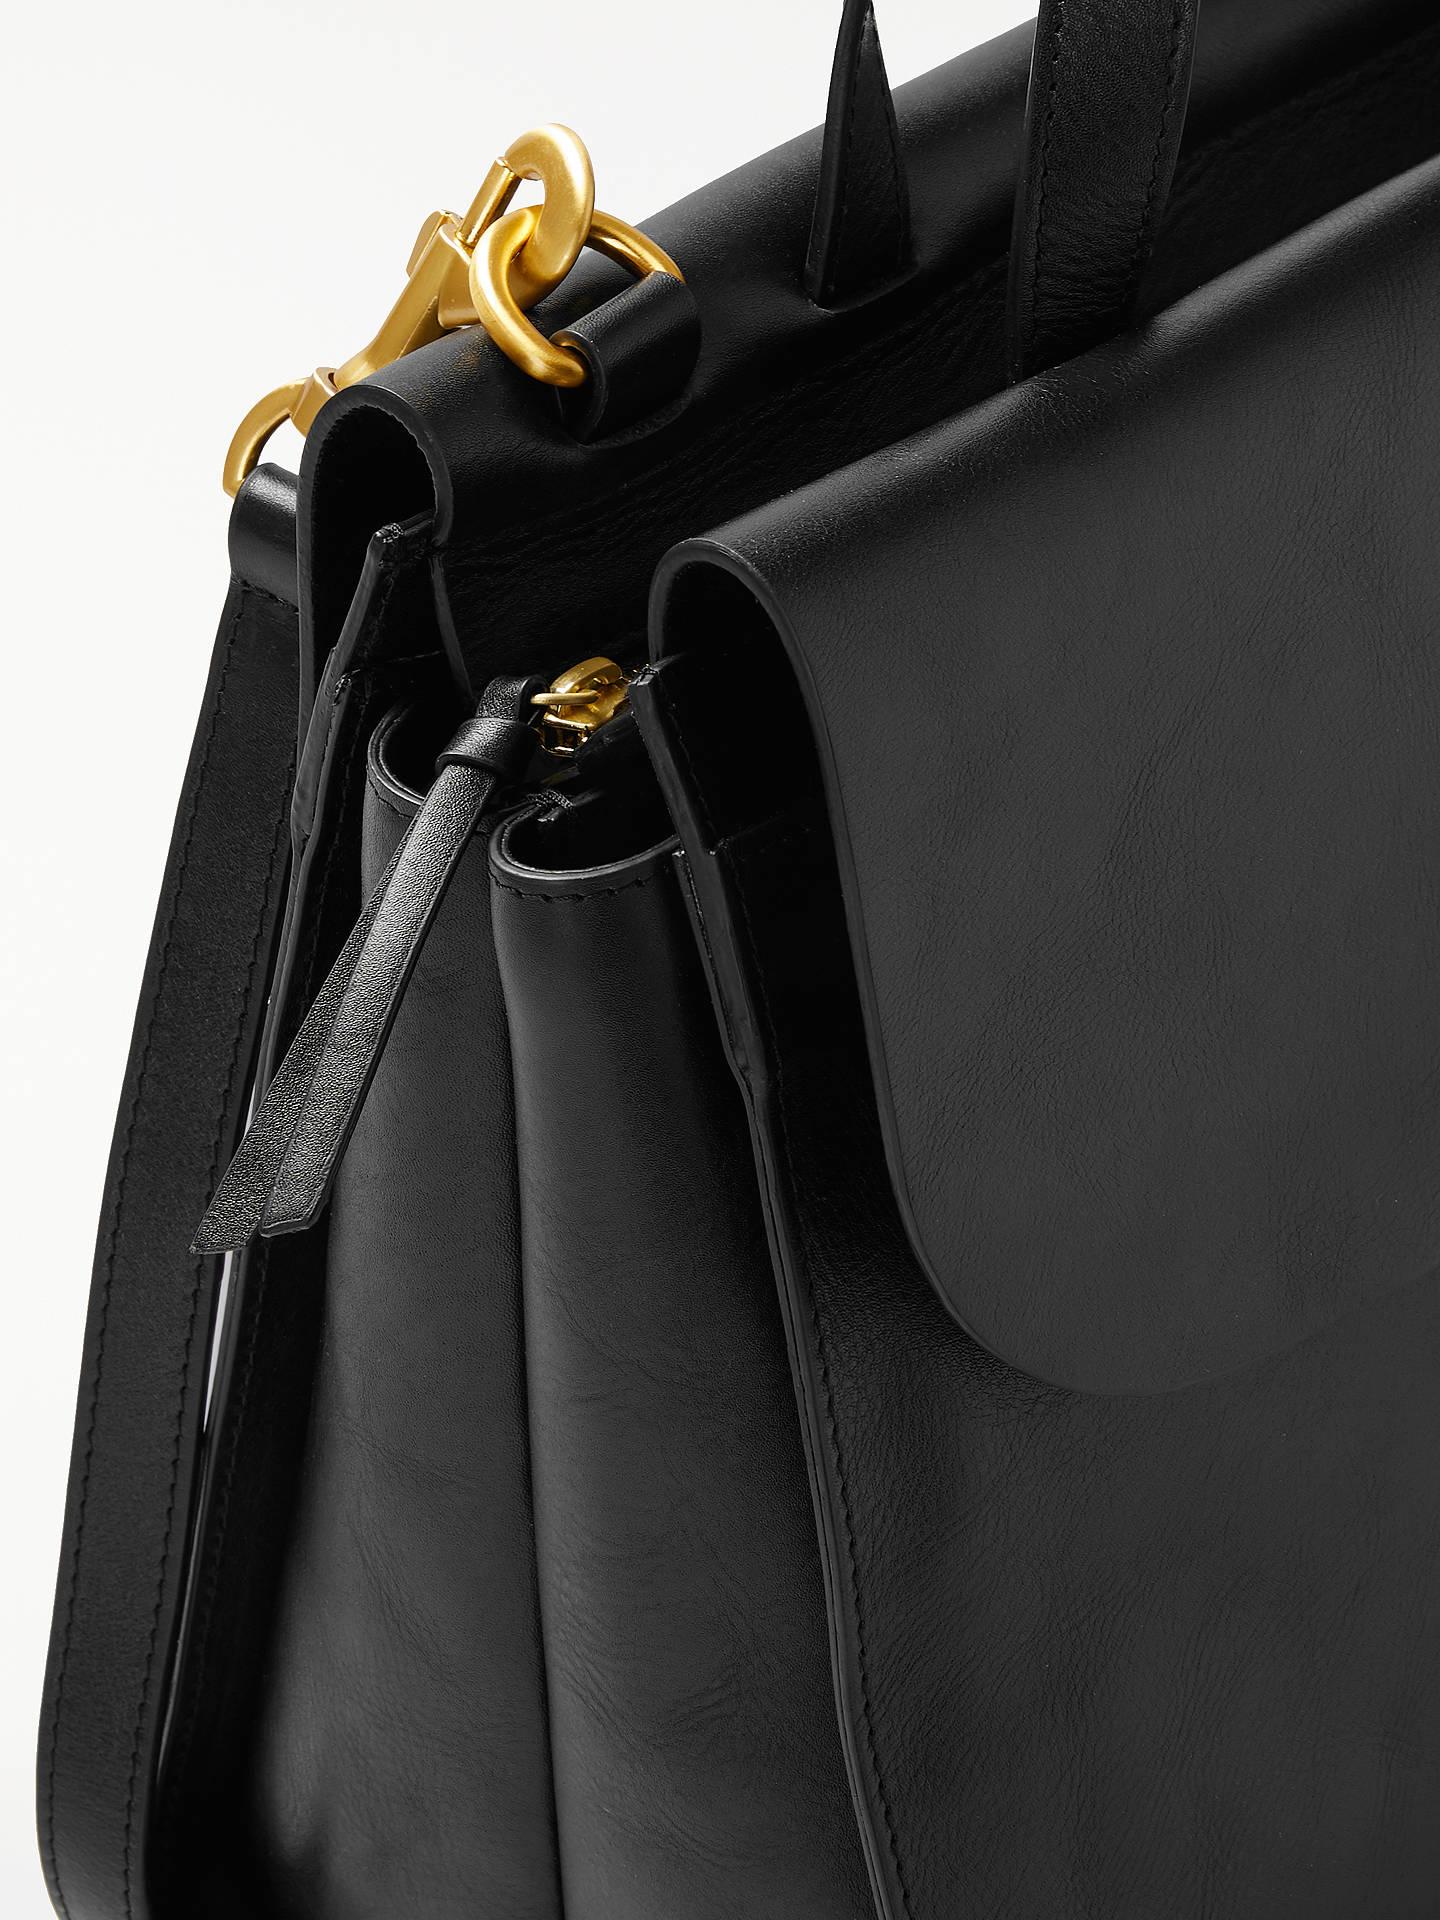 Leather Work Tote Bag Black